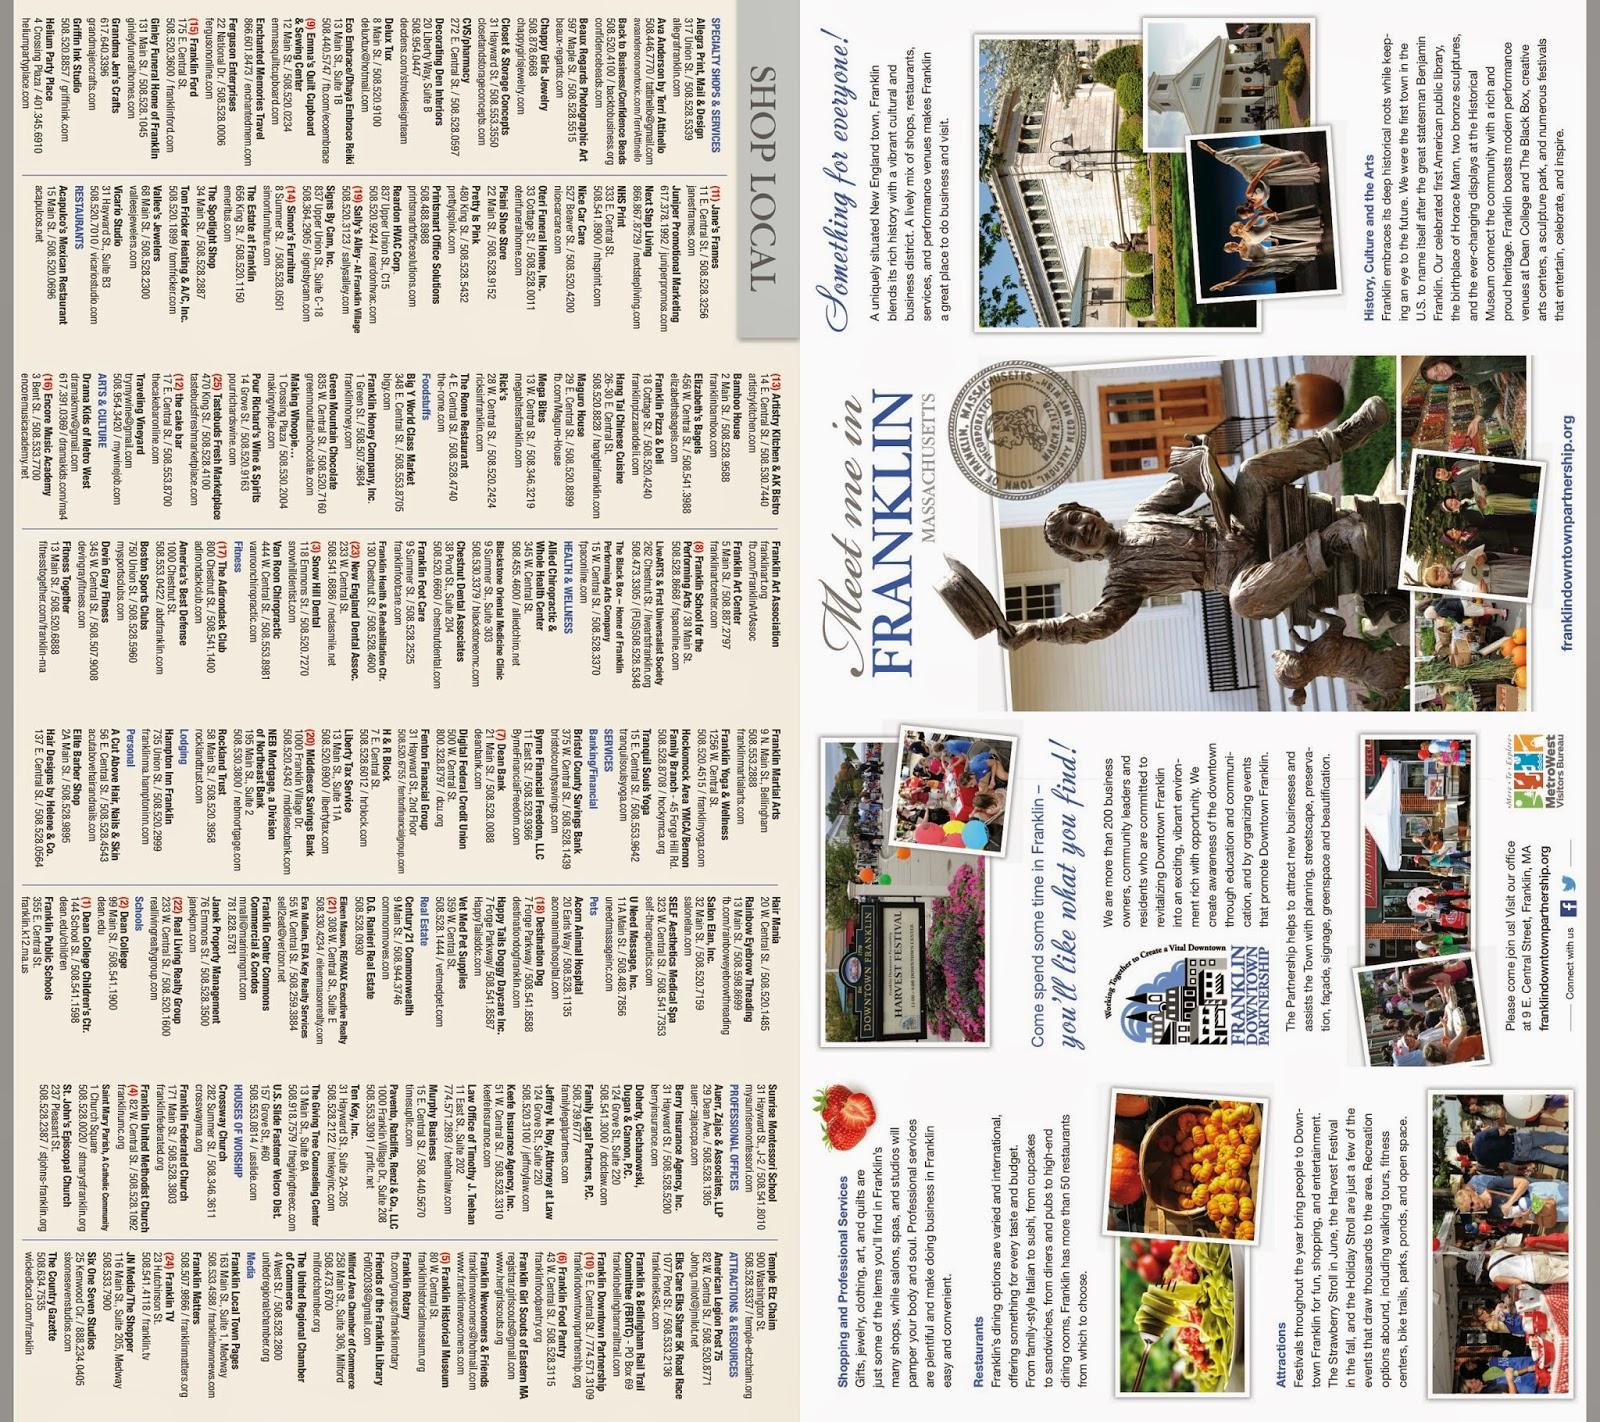 Franklin Downtown Partnership brochure - p1